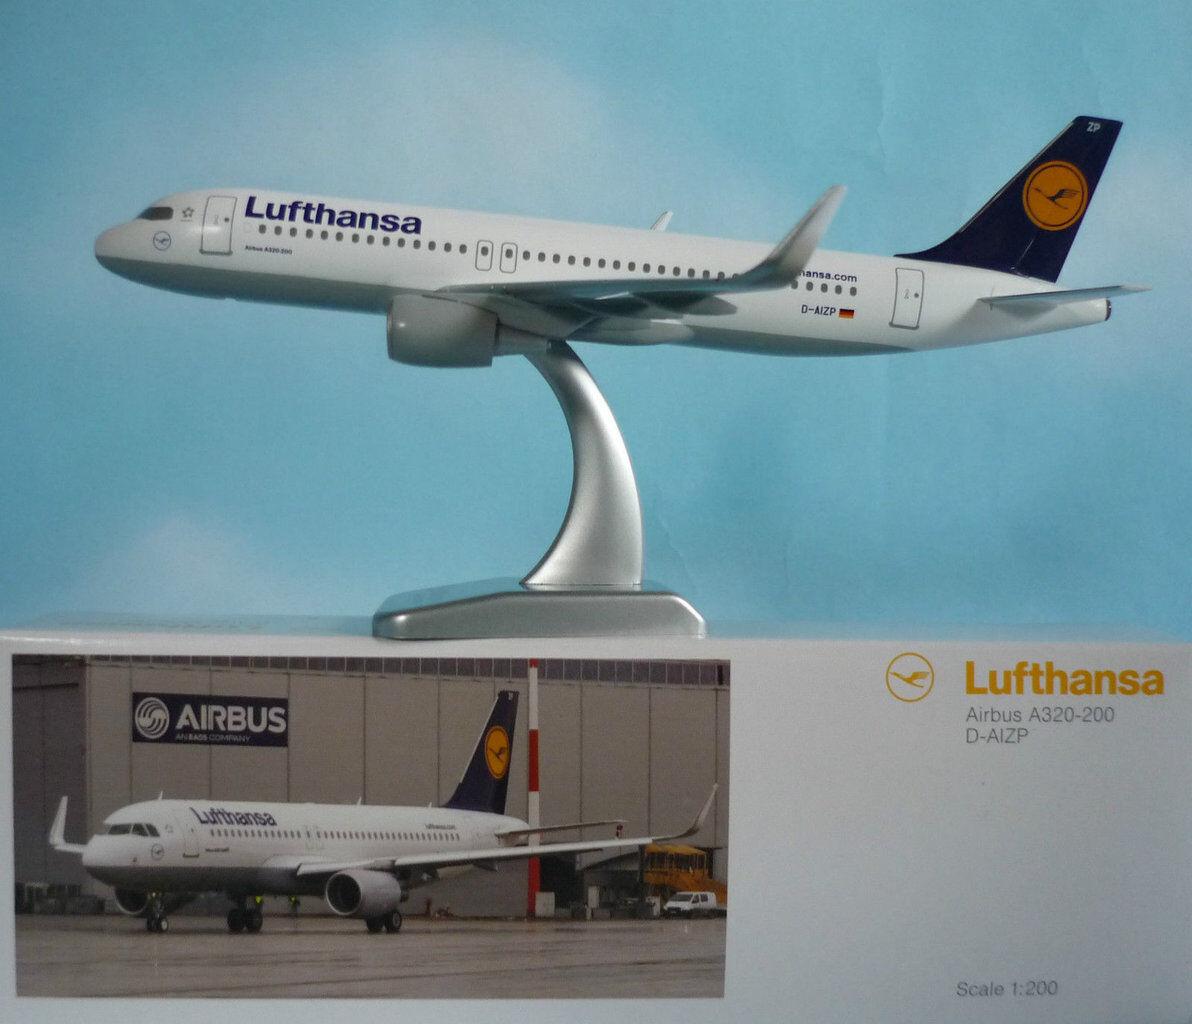 Lufthansa A-320-200 (D-AIZP), 1 200 200 200 Limox c520e9